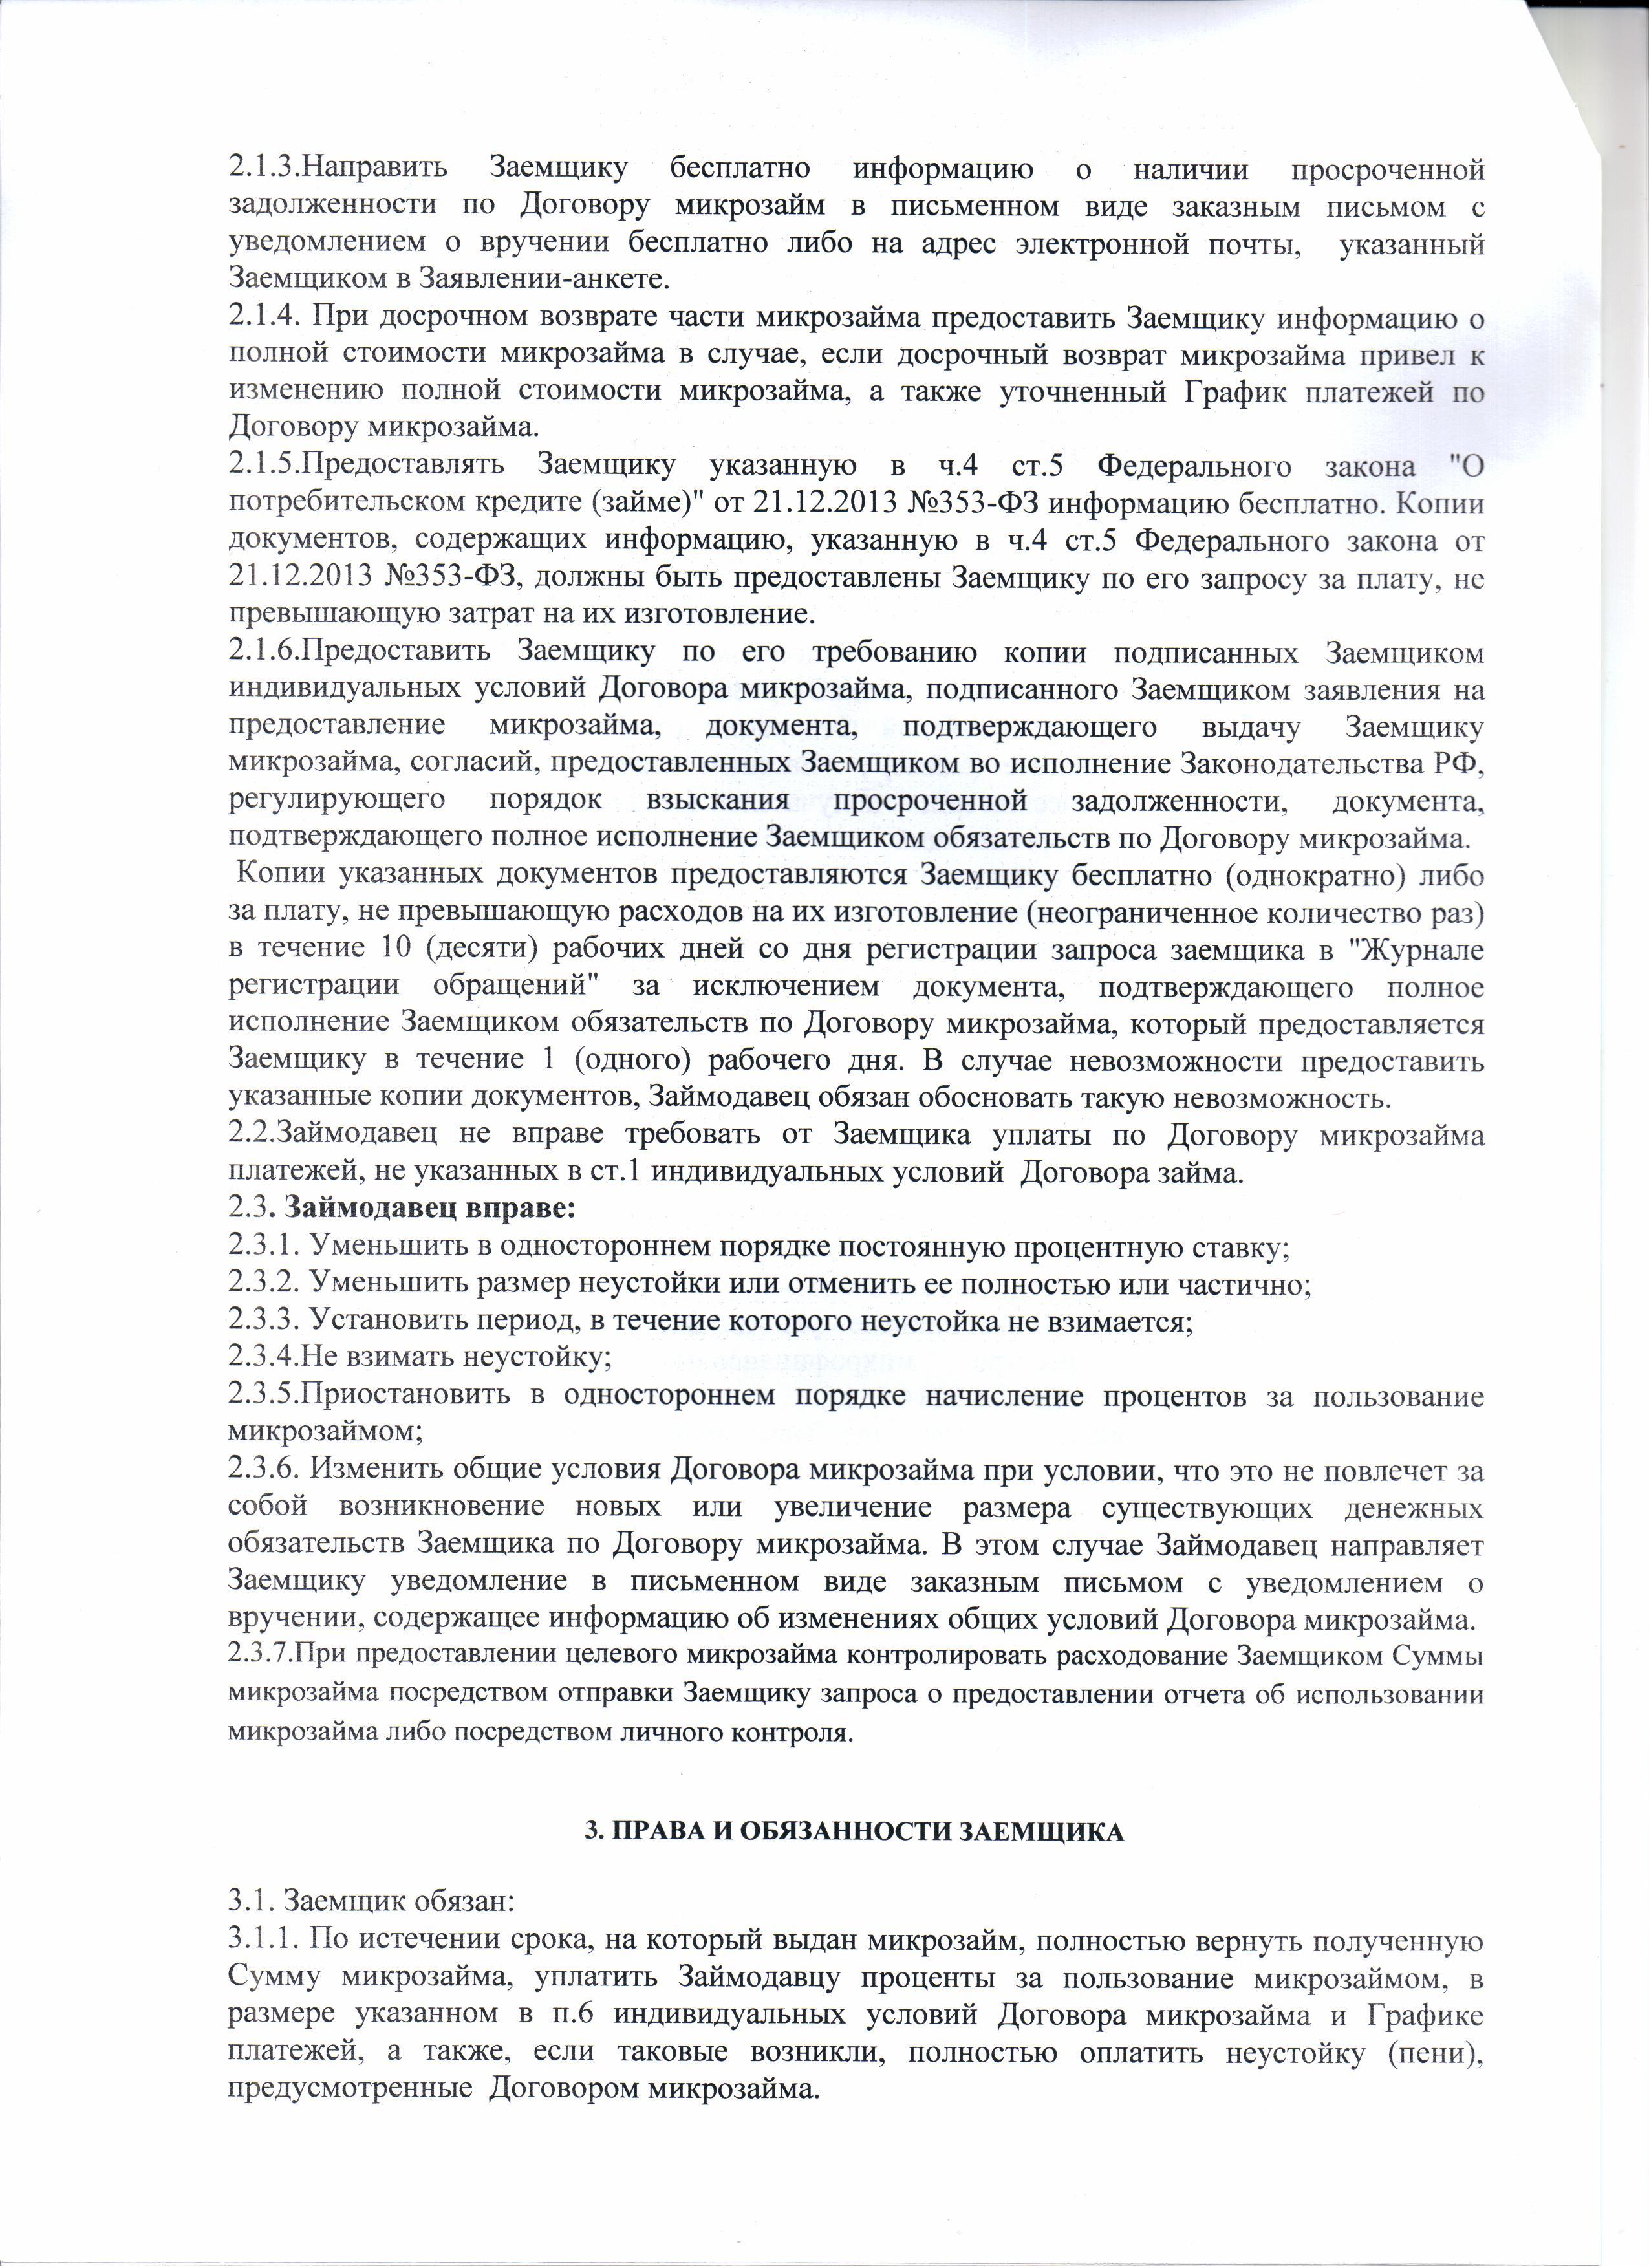 Общие условия договора микрозайма стр2